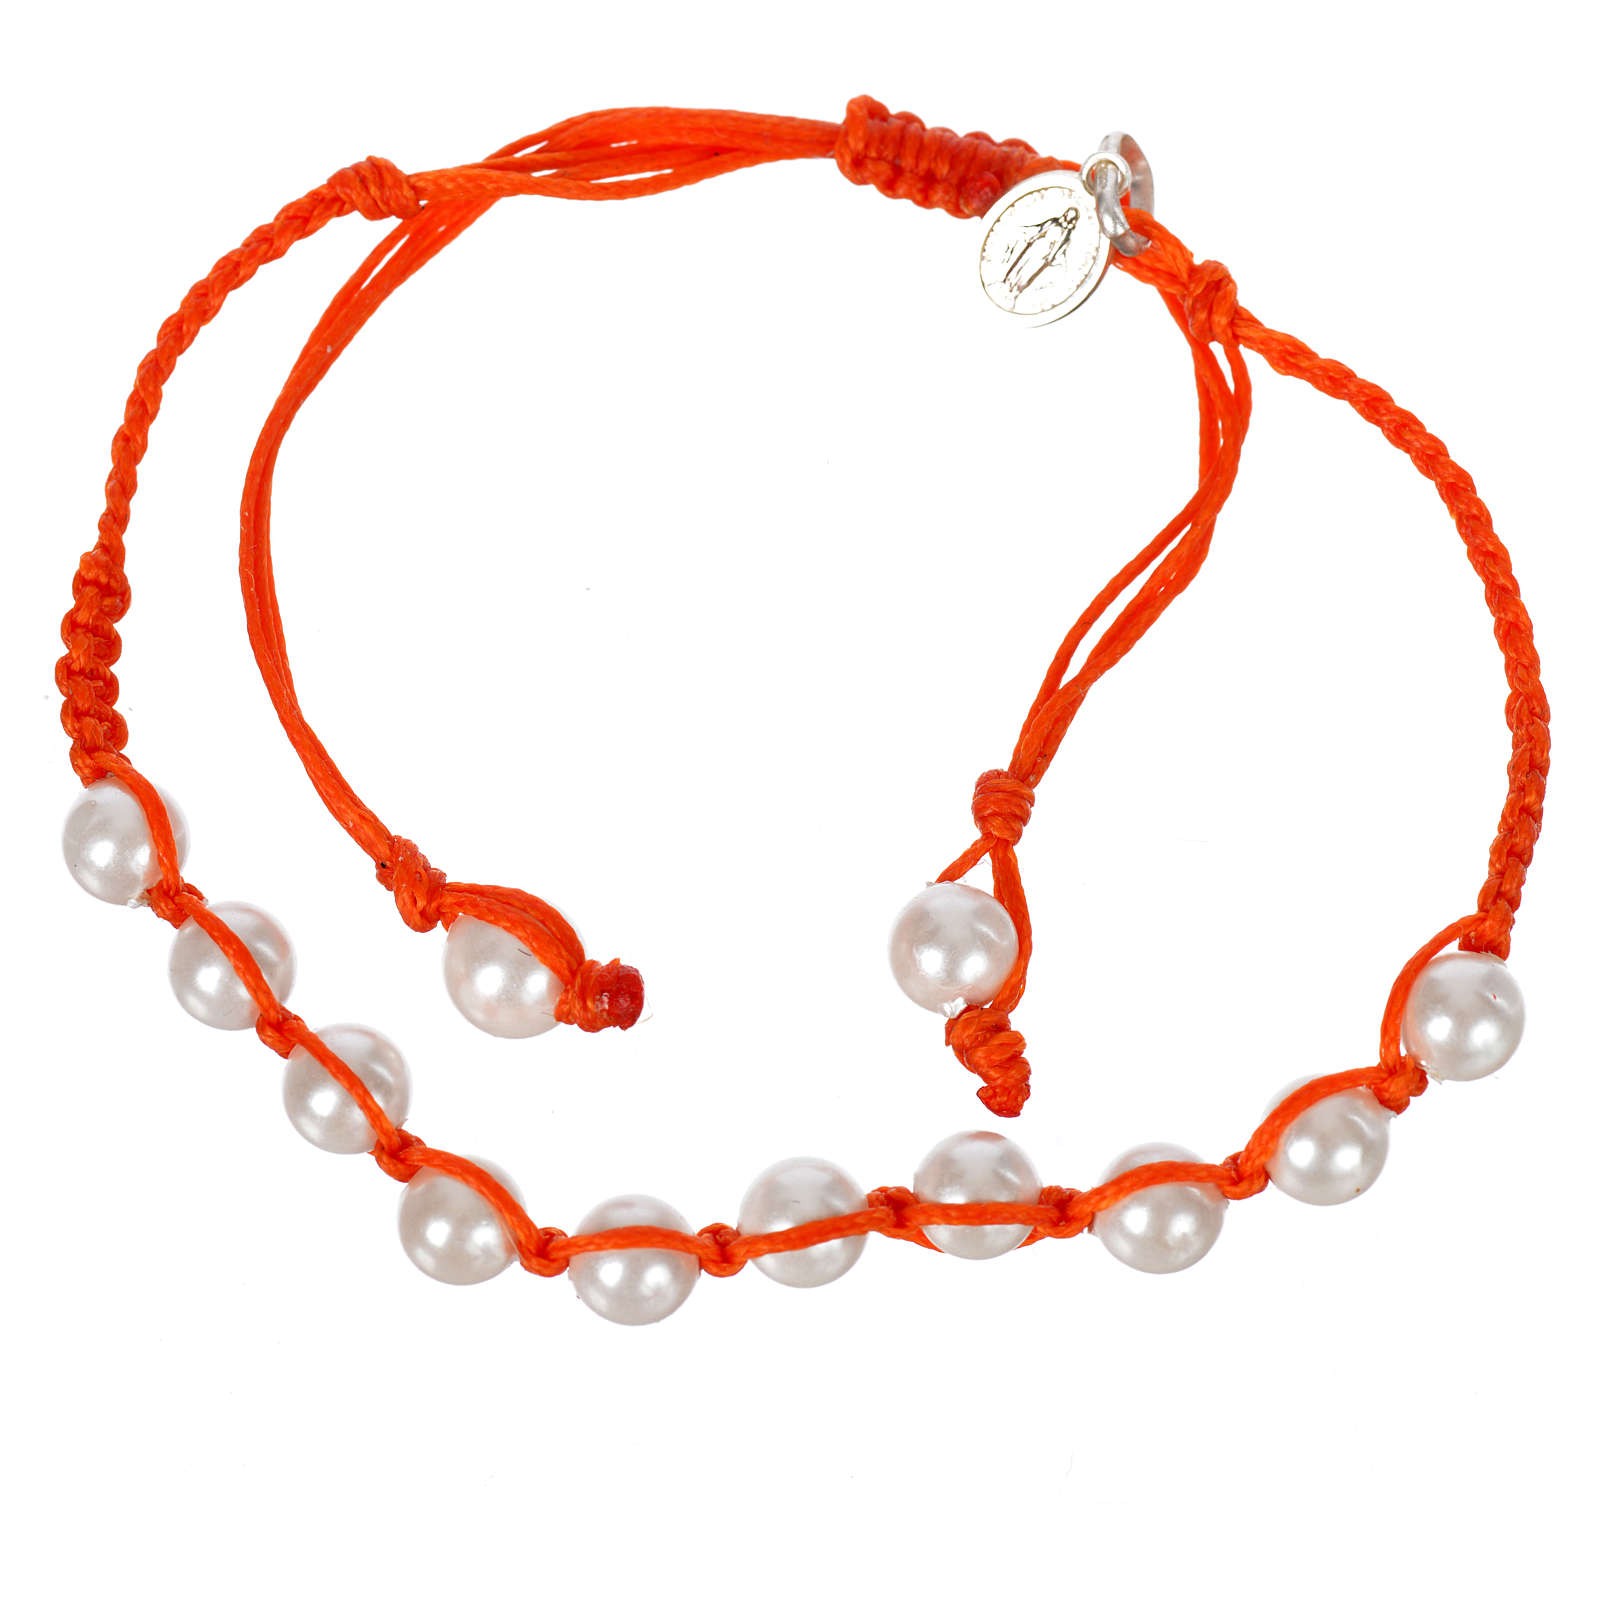 Bracciale Perla Bianca Med Mir Arg 925 corda arancio 4